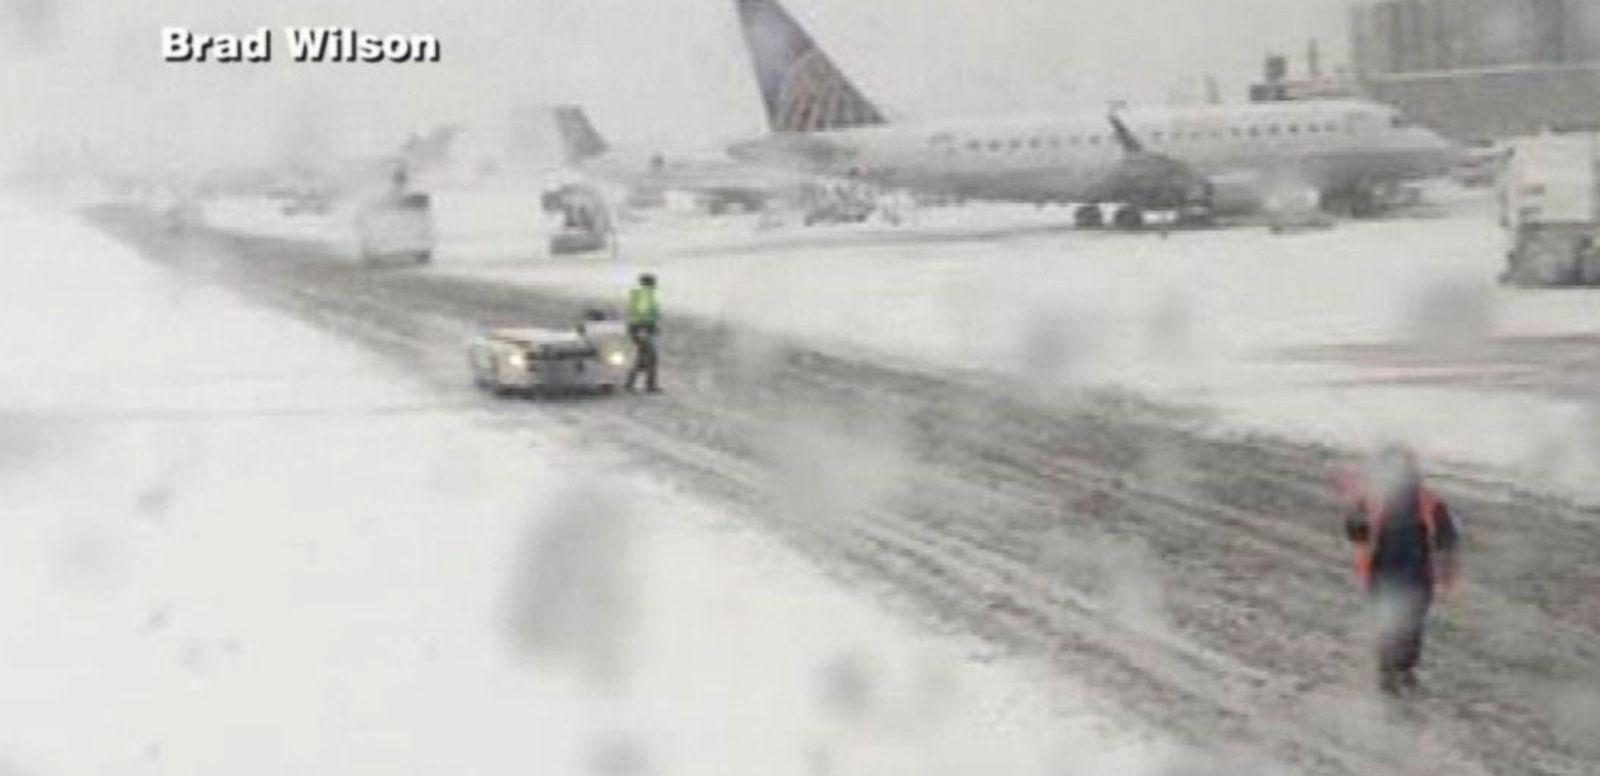 VIDEO: Plane Makes Emergency Landing After Smoke Fills Cockpit